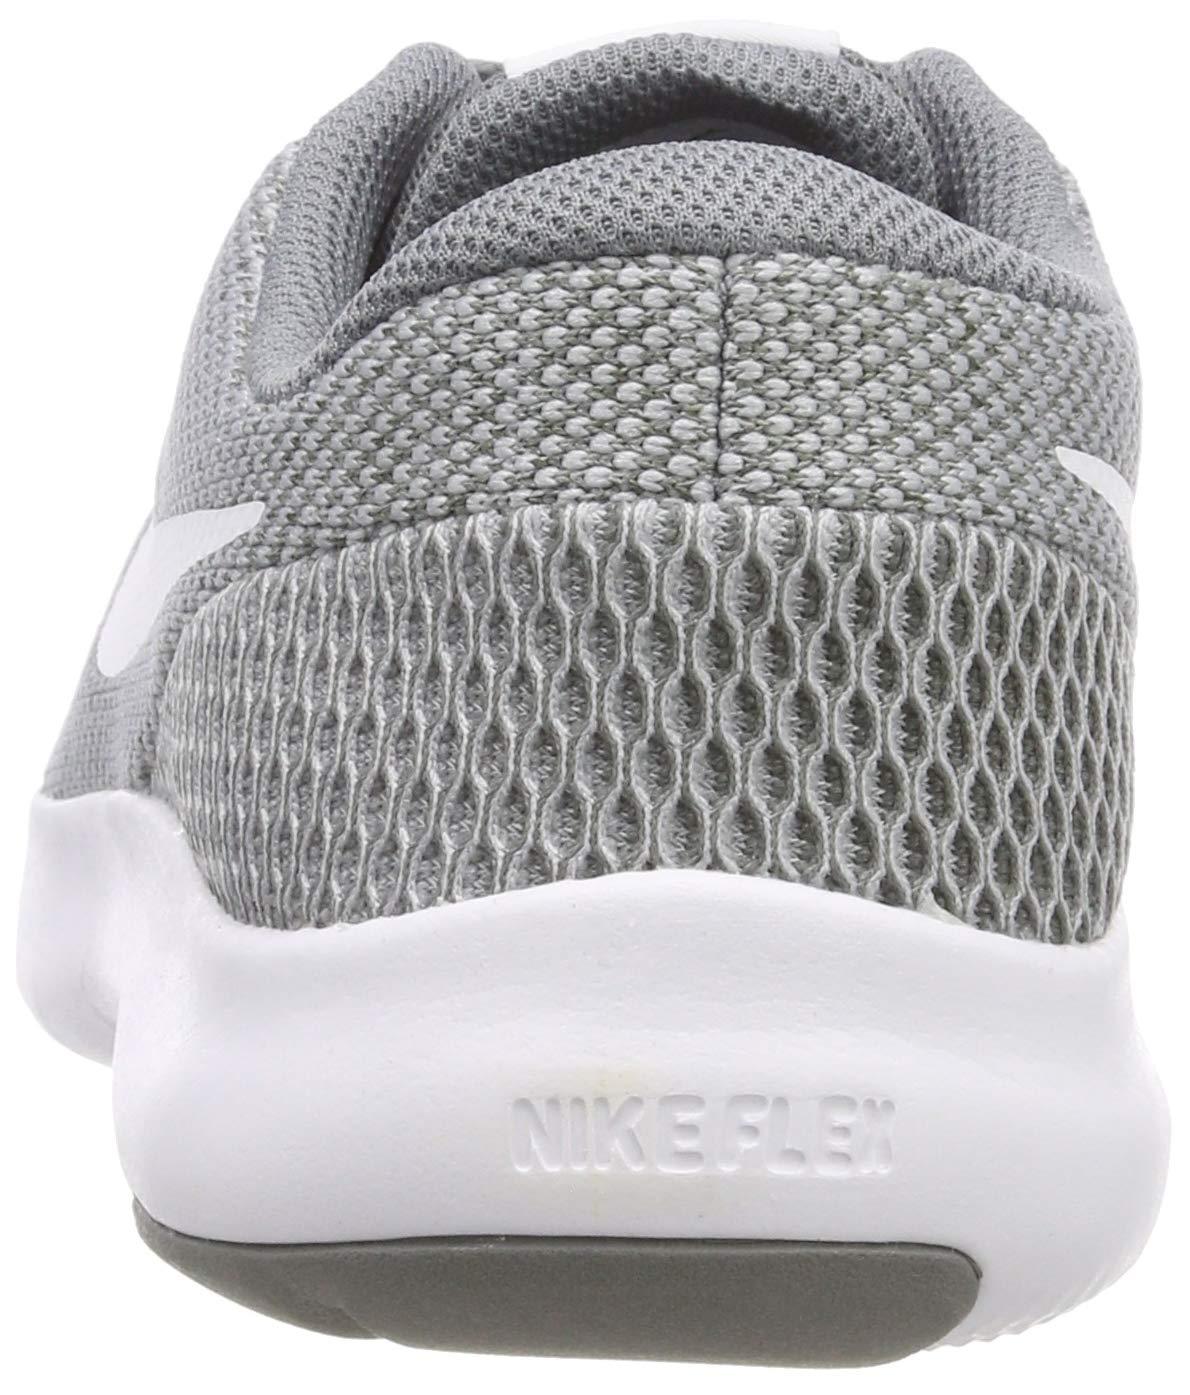 Nike Flex Experience Rn 7 (gs) Big Kids 943284-003 Size 4 by Nike (Image #2)